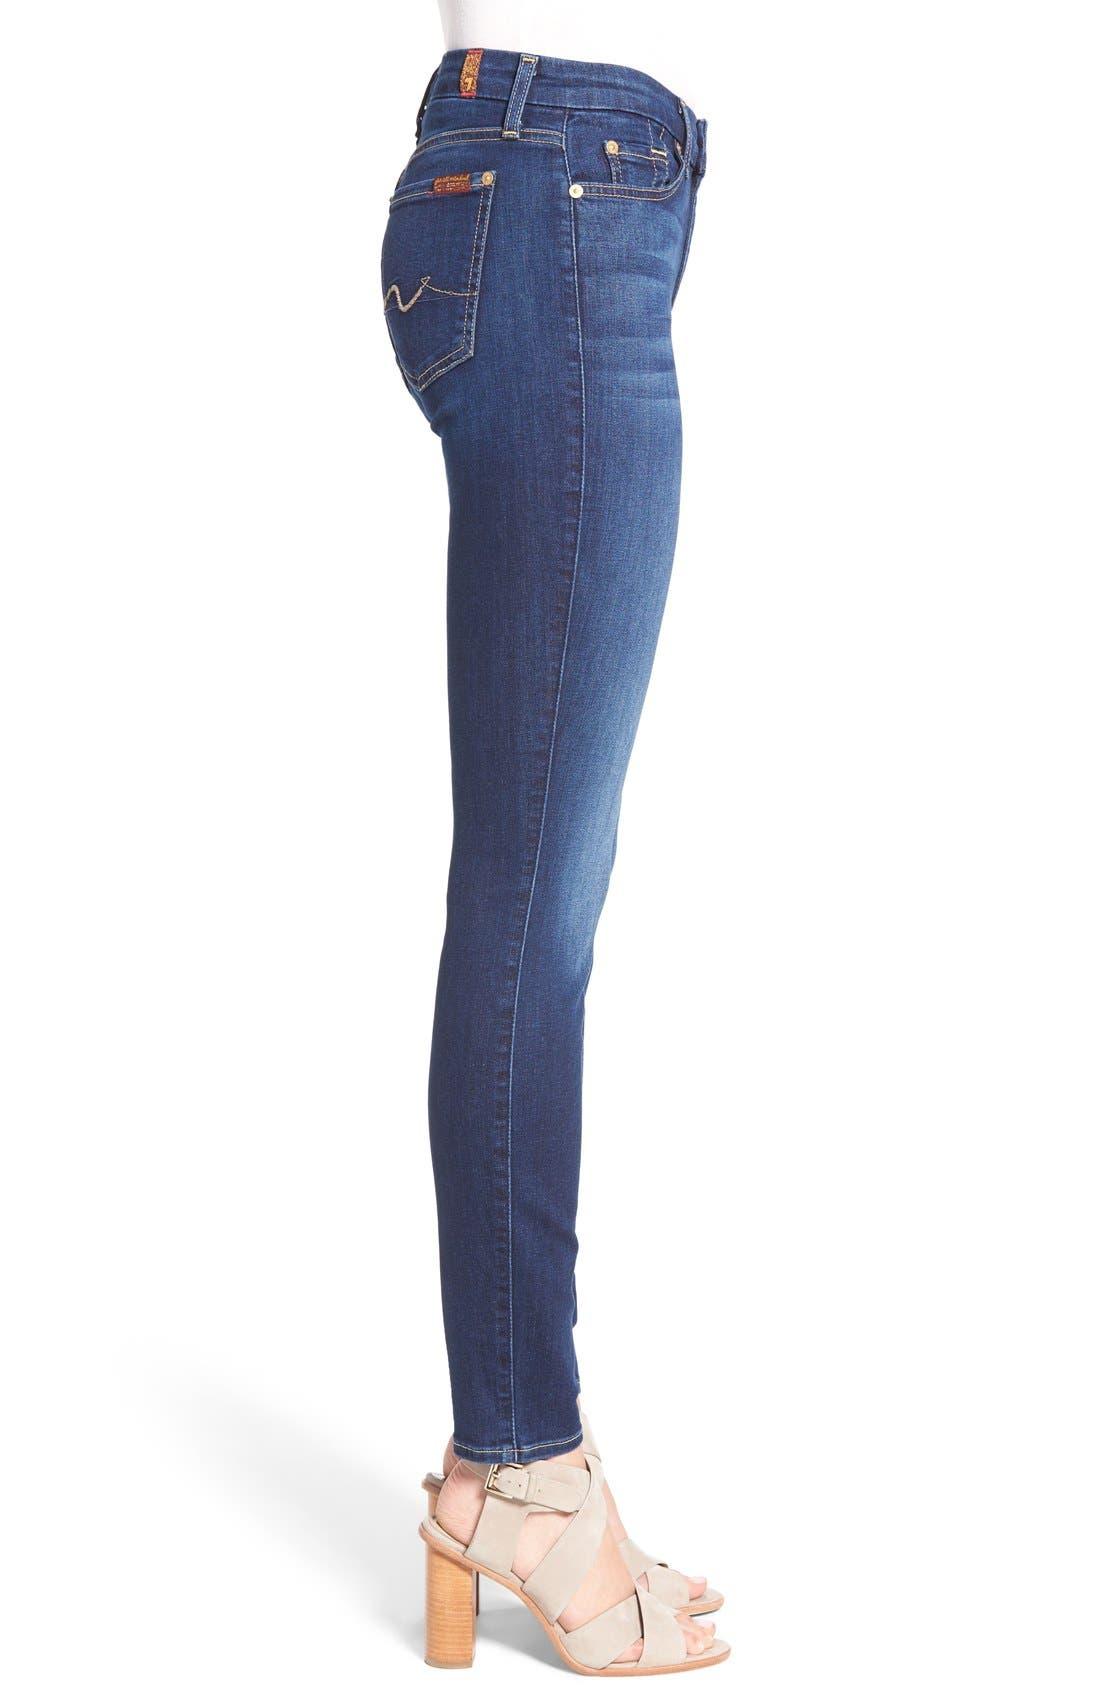 b(air) Skinny Jeans,                             Alternate thumbnail 5, color,                             400